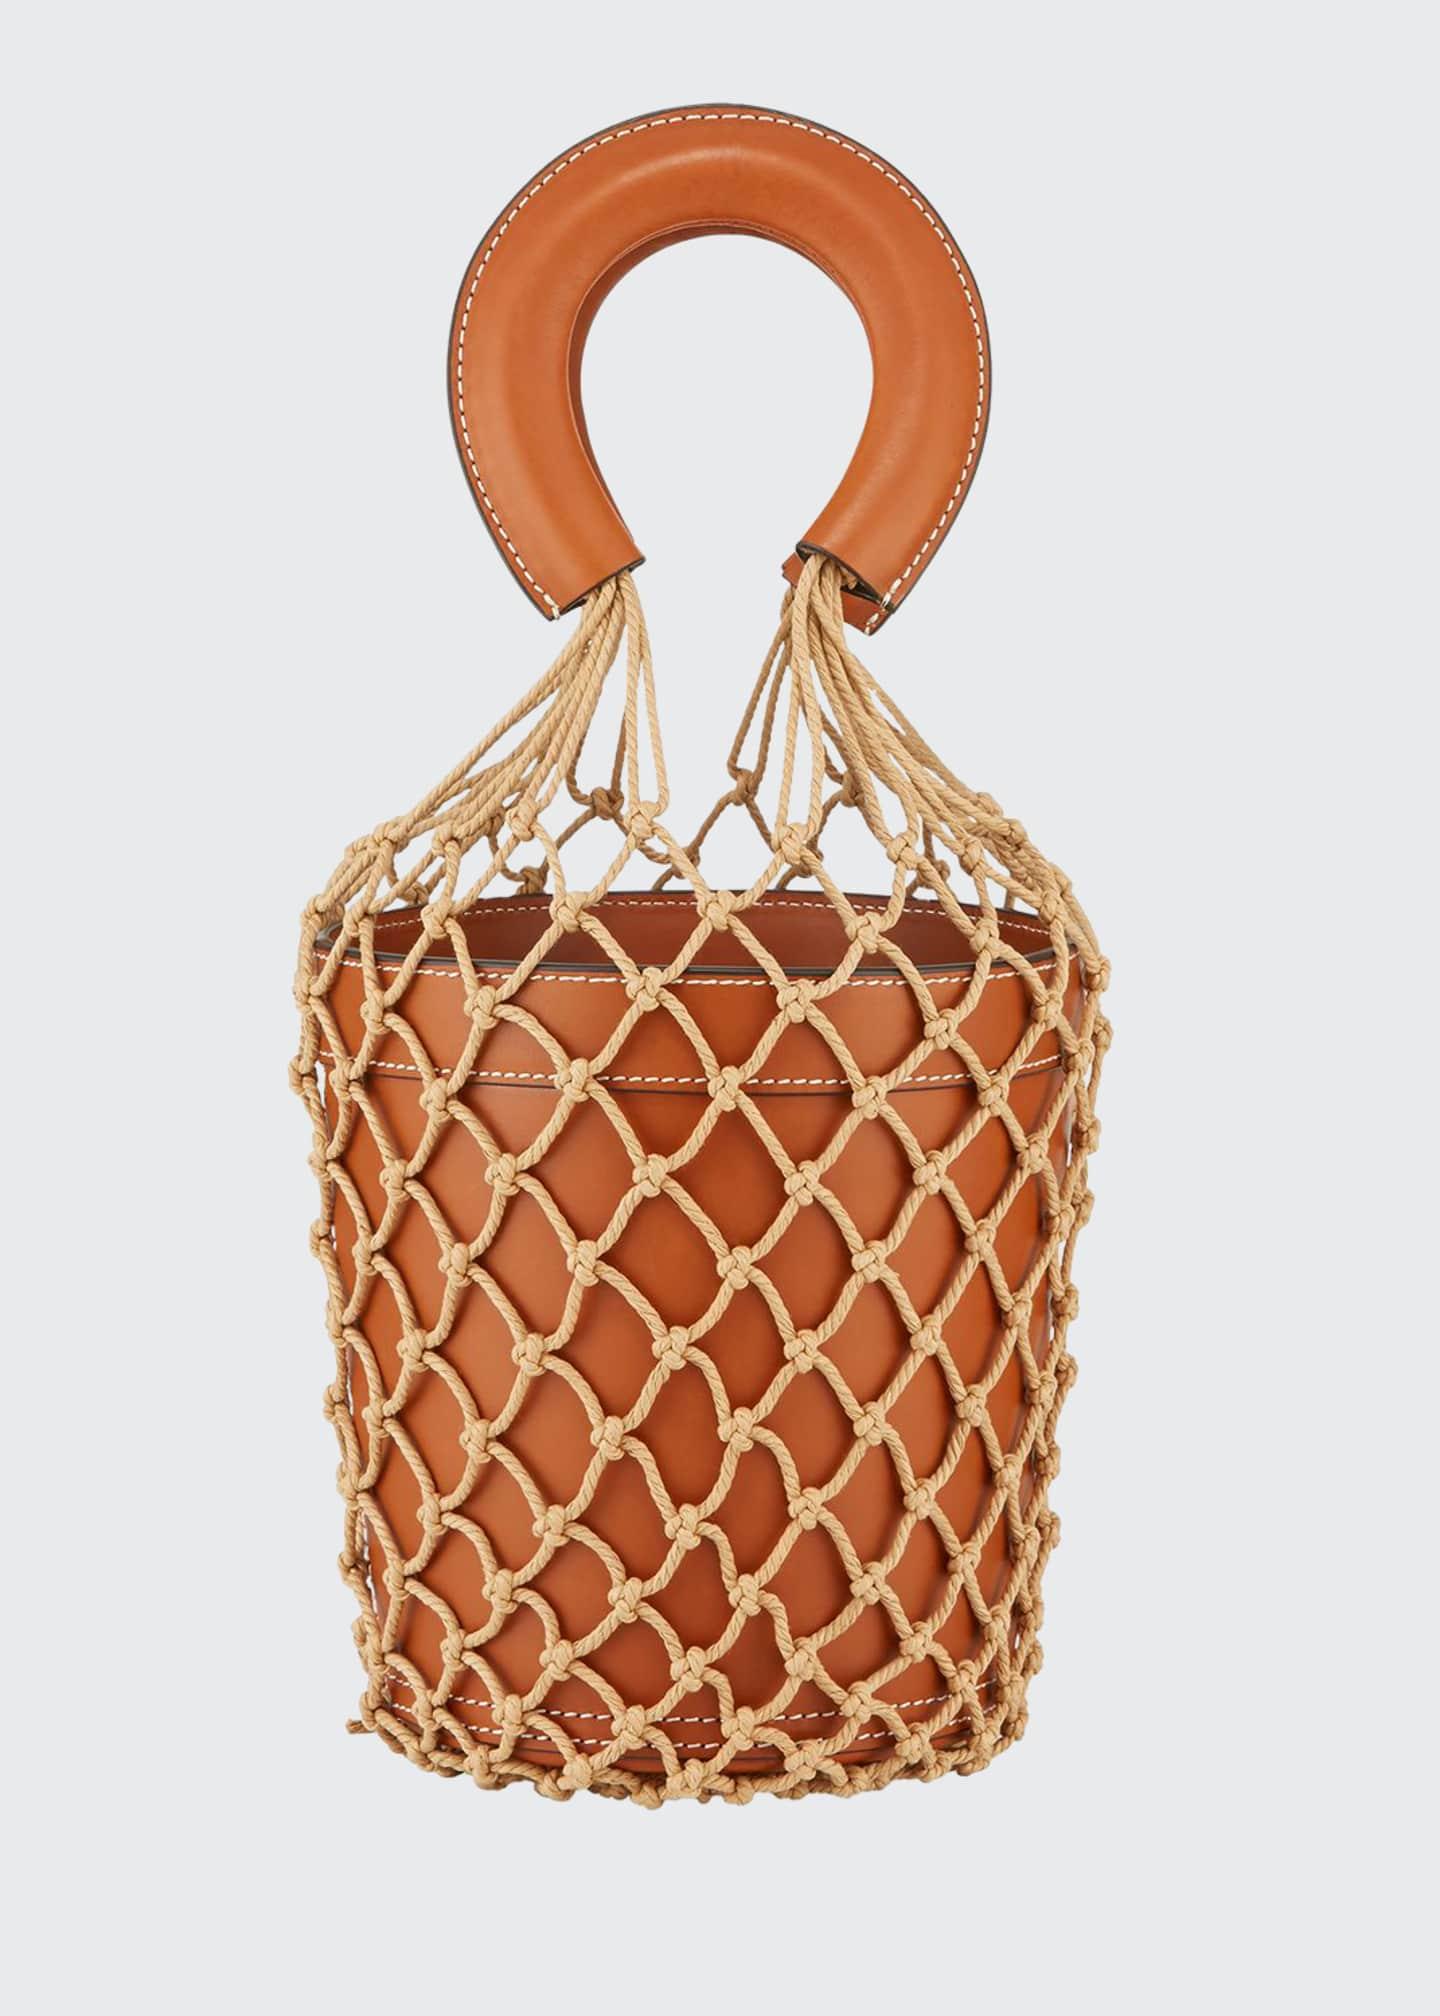 Staud Moreau Leather and Net Bucket Bag